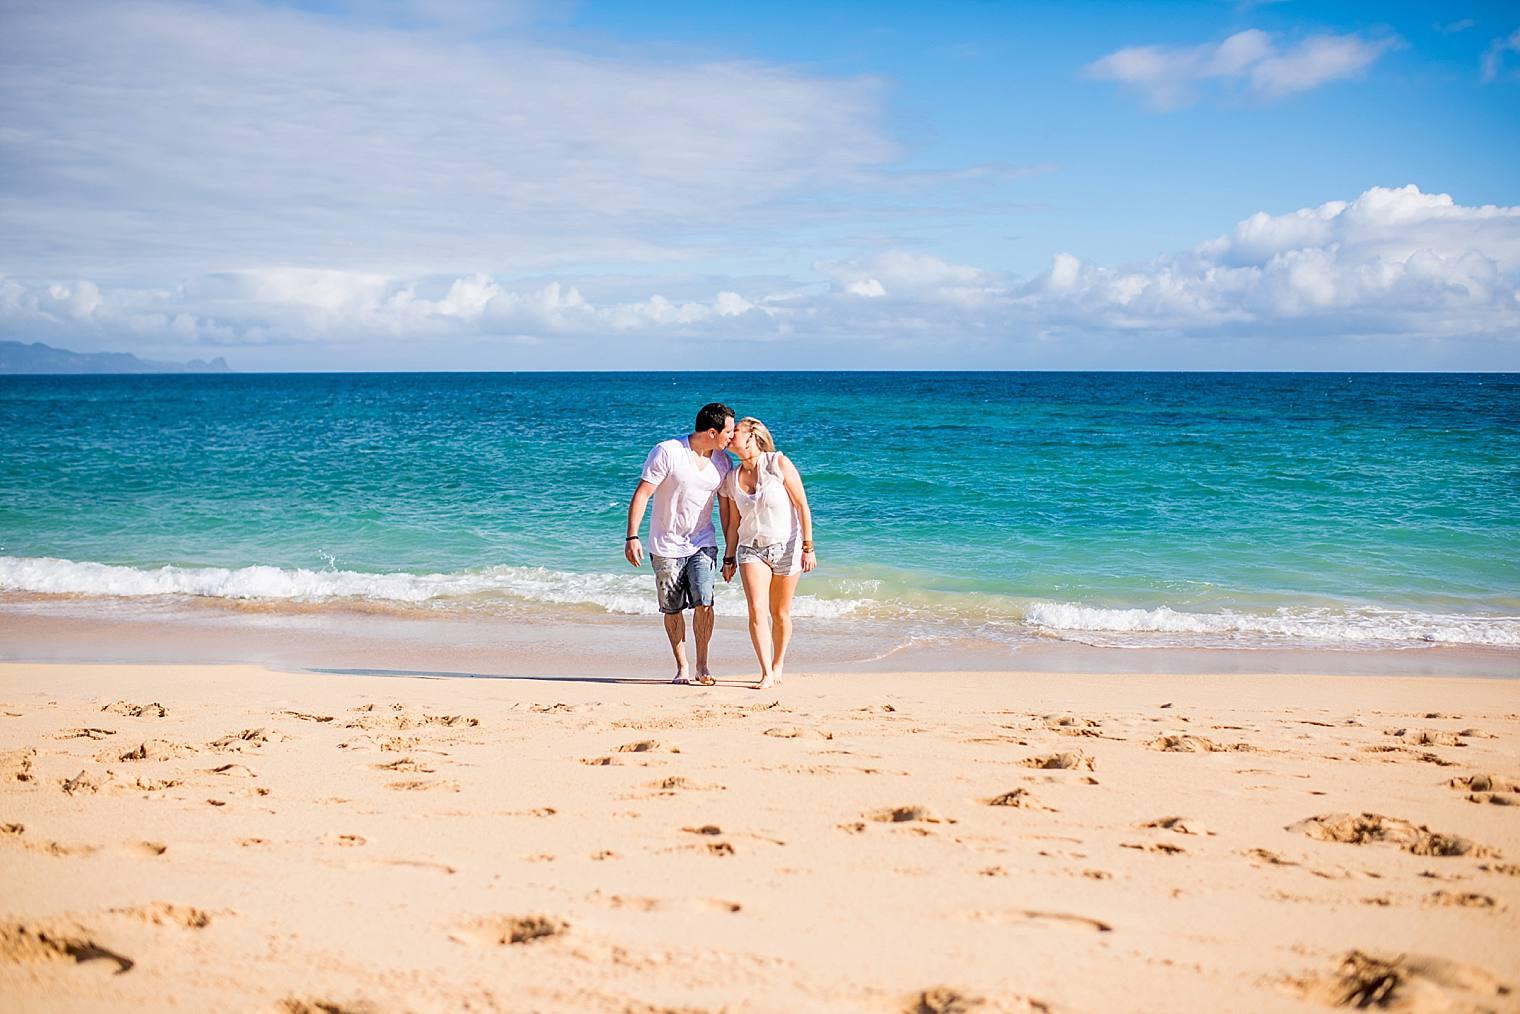 couple kissing on beach in maui, hawaii